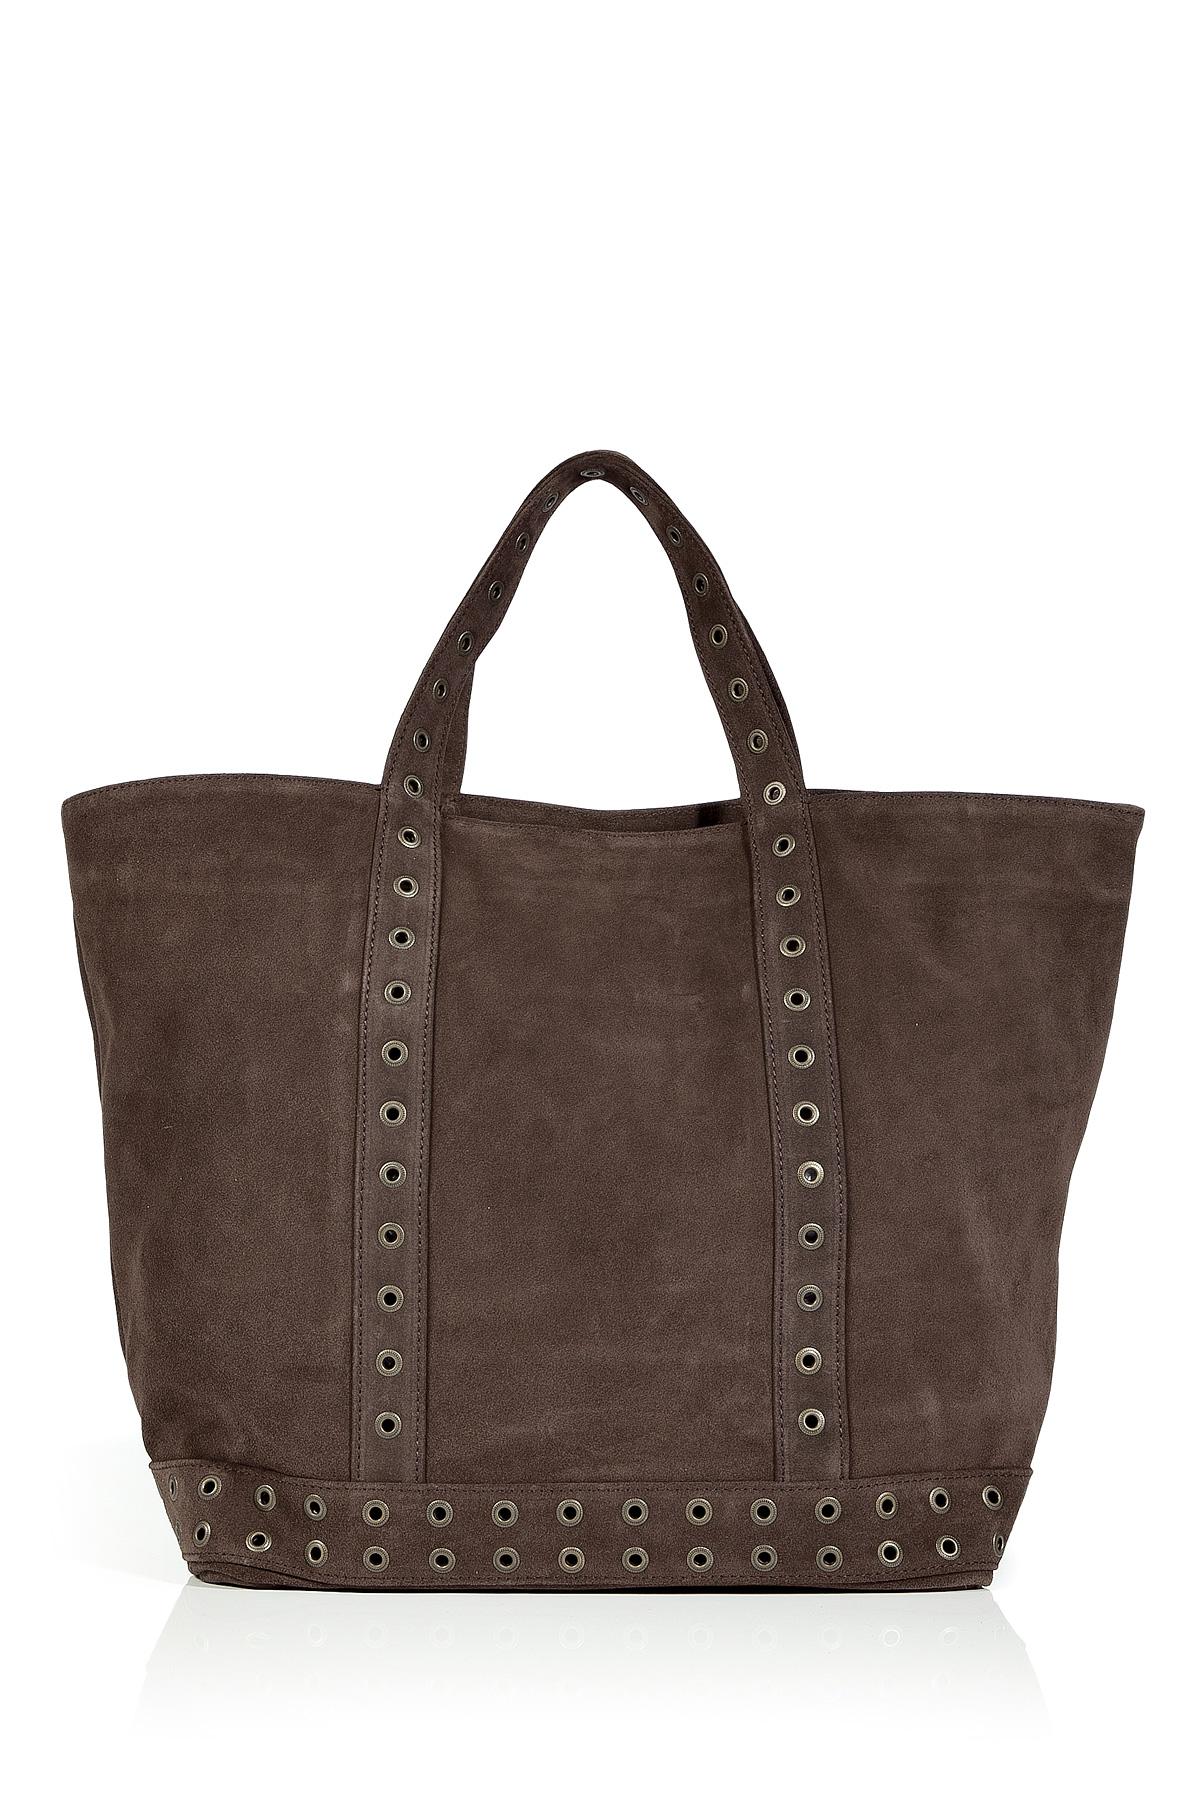 vanessa bruno warm chocolate studded suede big cabas bag in brown chocolate lyst. Black Bedroom Furniture Sets. Home Design Ideas